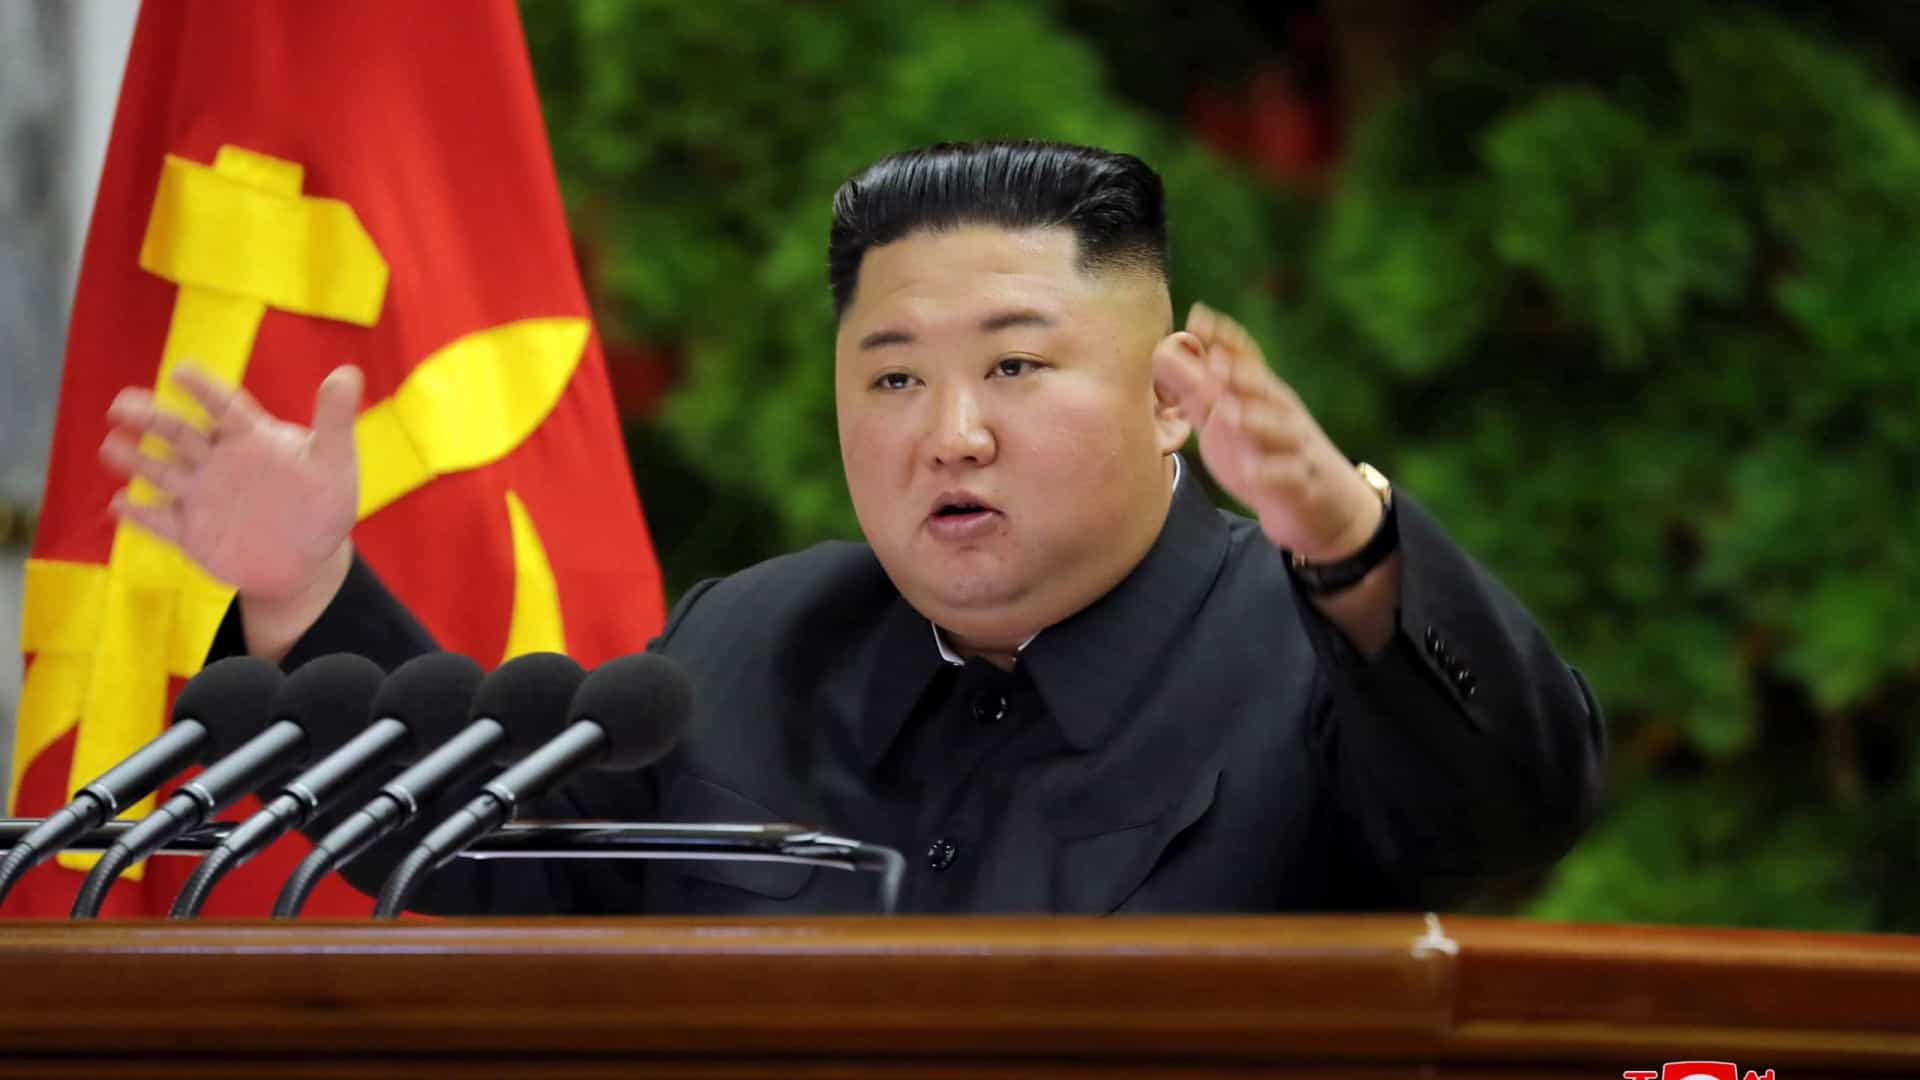 IMAGEM: Kim Jong-un alerta para possível crise alimentar na Coreia do Norte